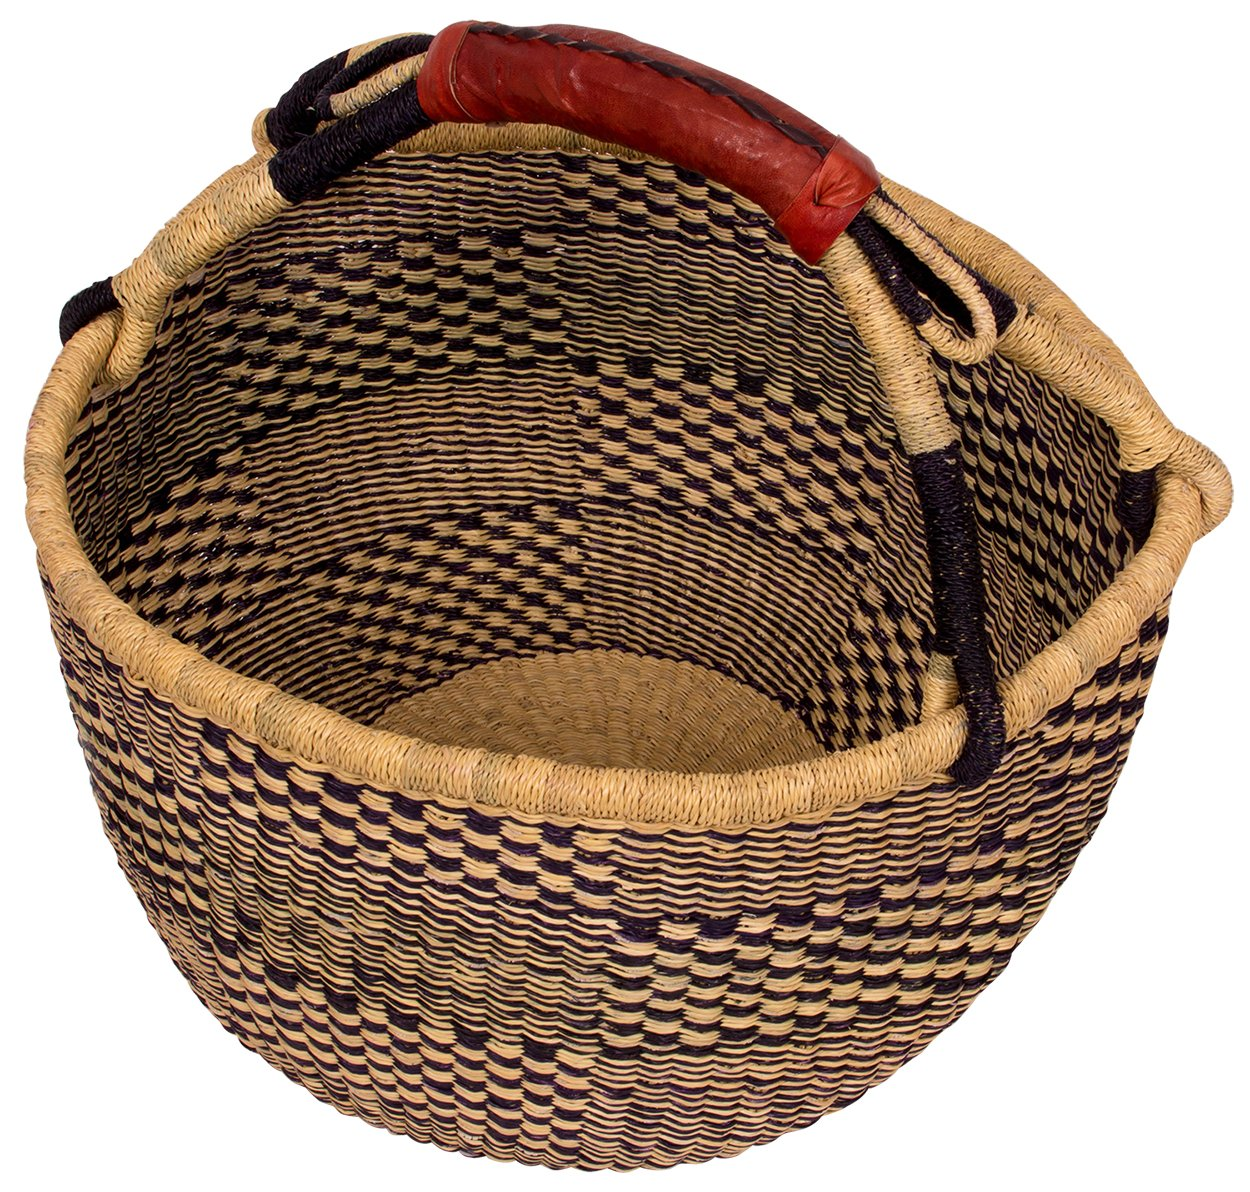 ad4f89a795 Amazon.com  AFRICAN MARKET BASKET African Round Basket